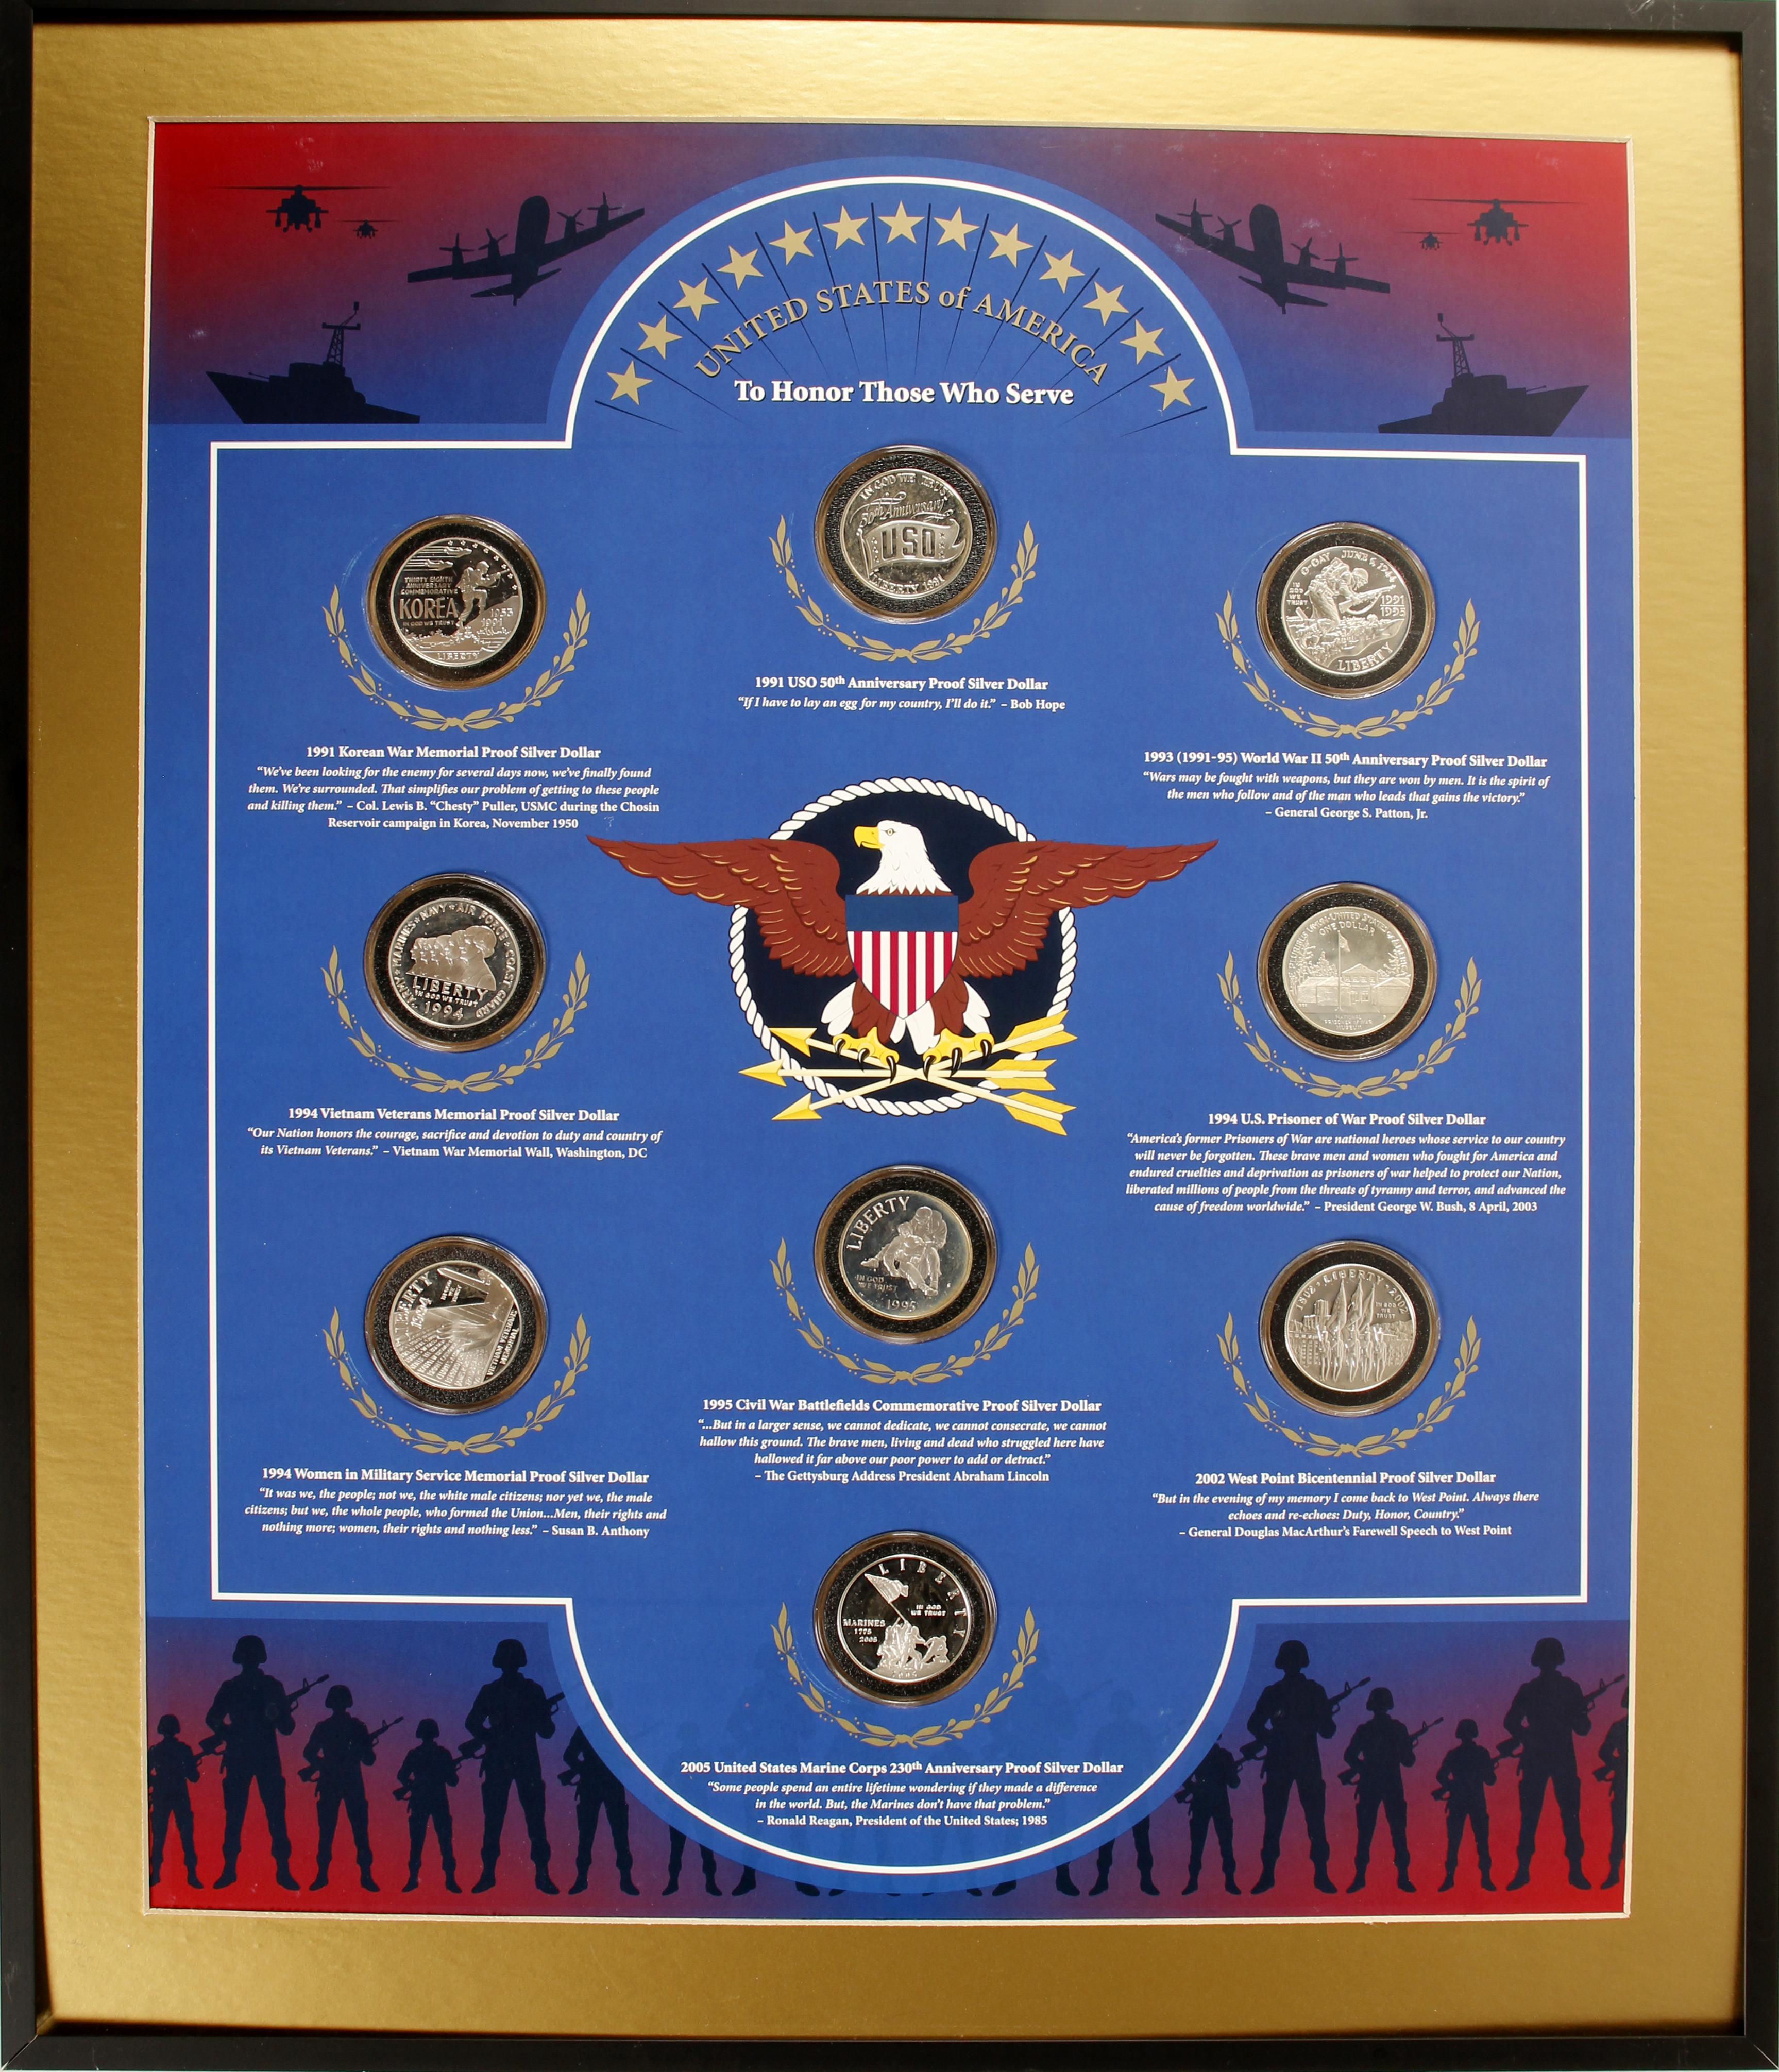 Framed Set of 9 Silver Coins Honoring US Military Veterans, Set #2/4 (77125)